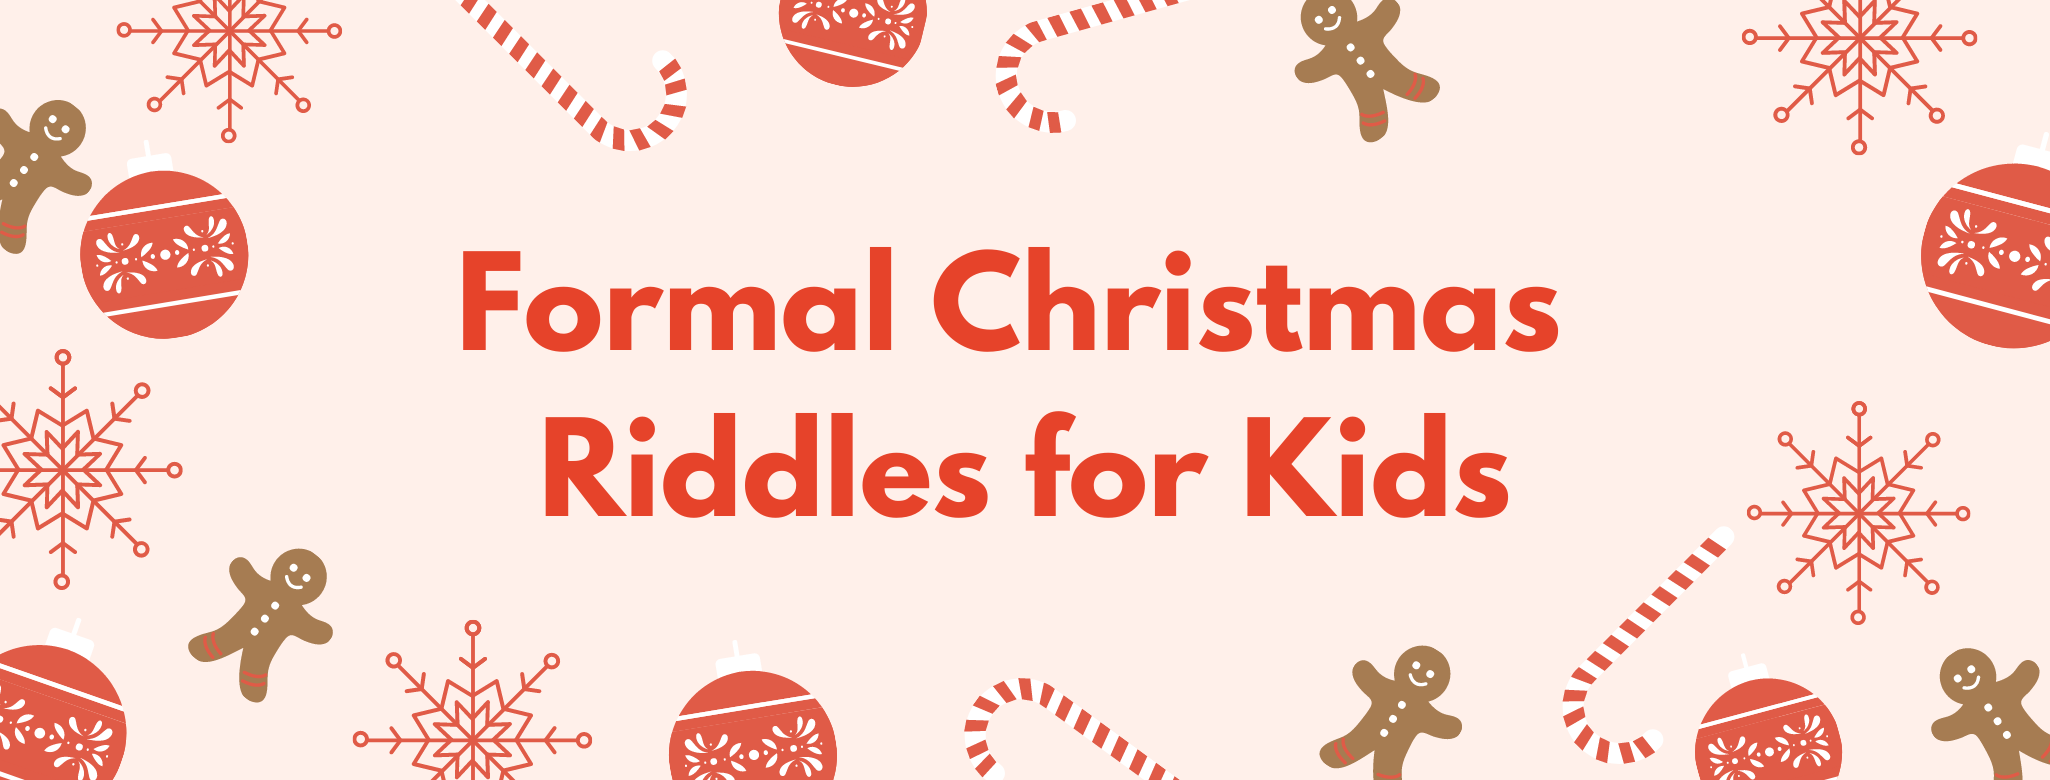 Christmas Riddles for church group, christian family